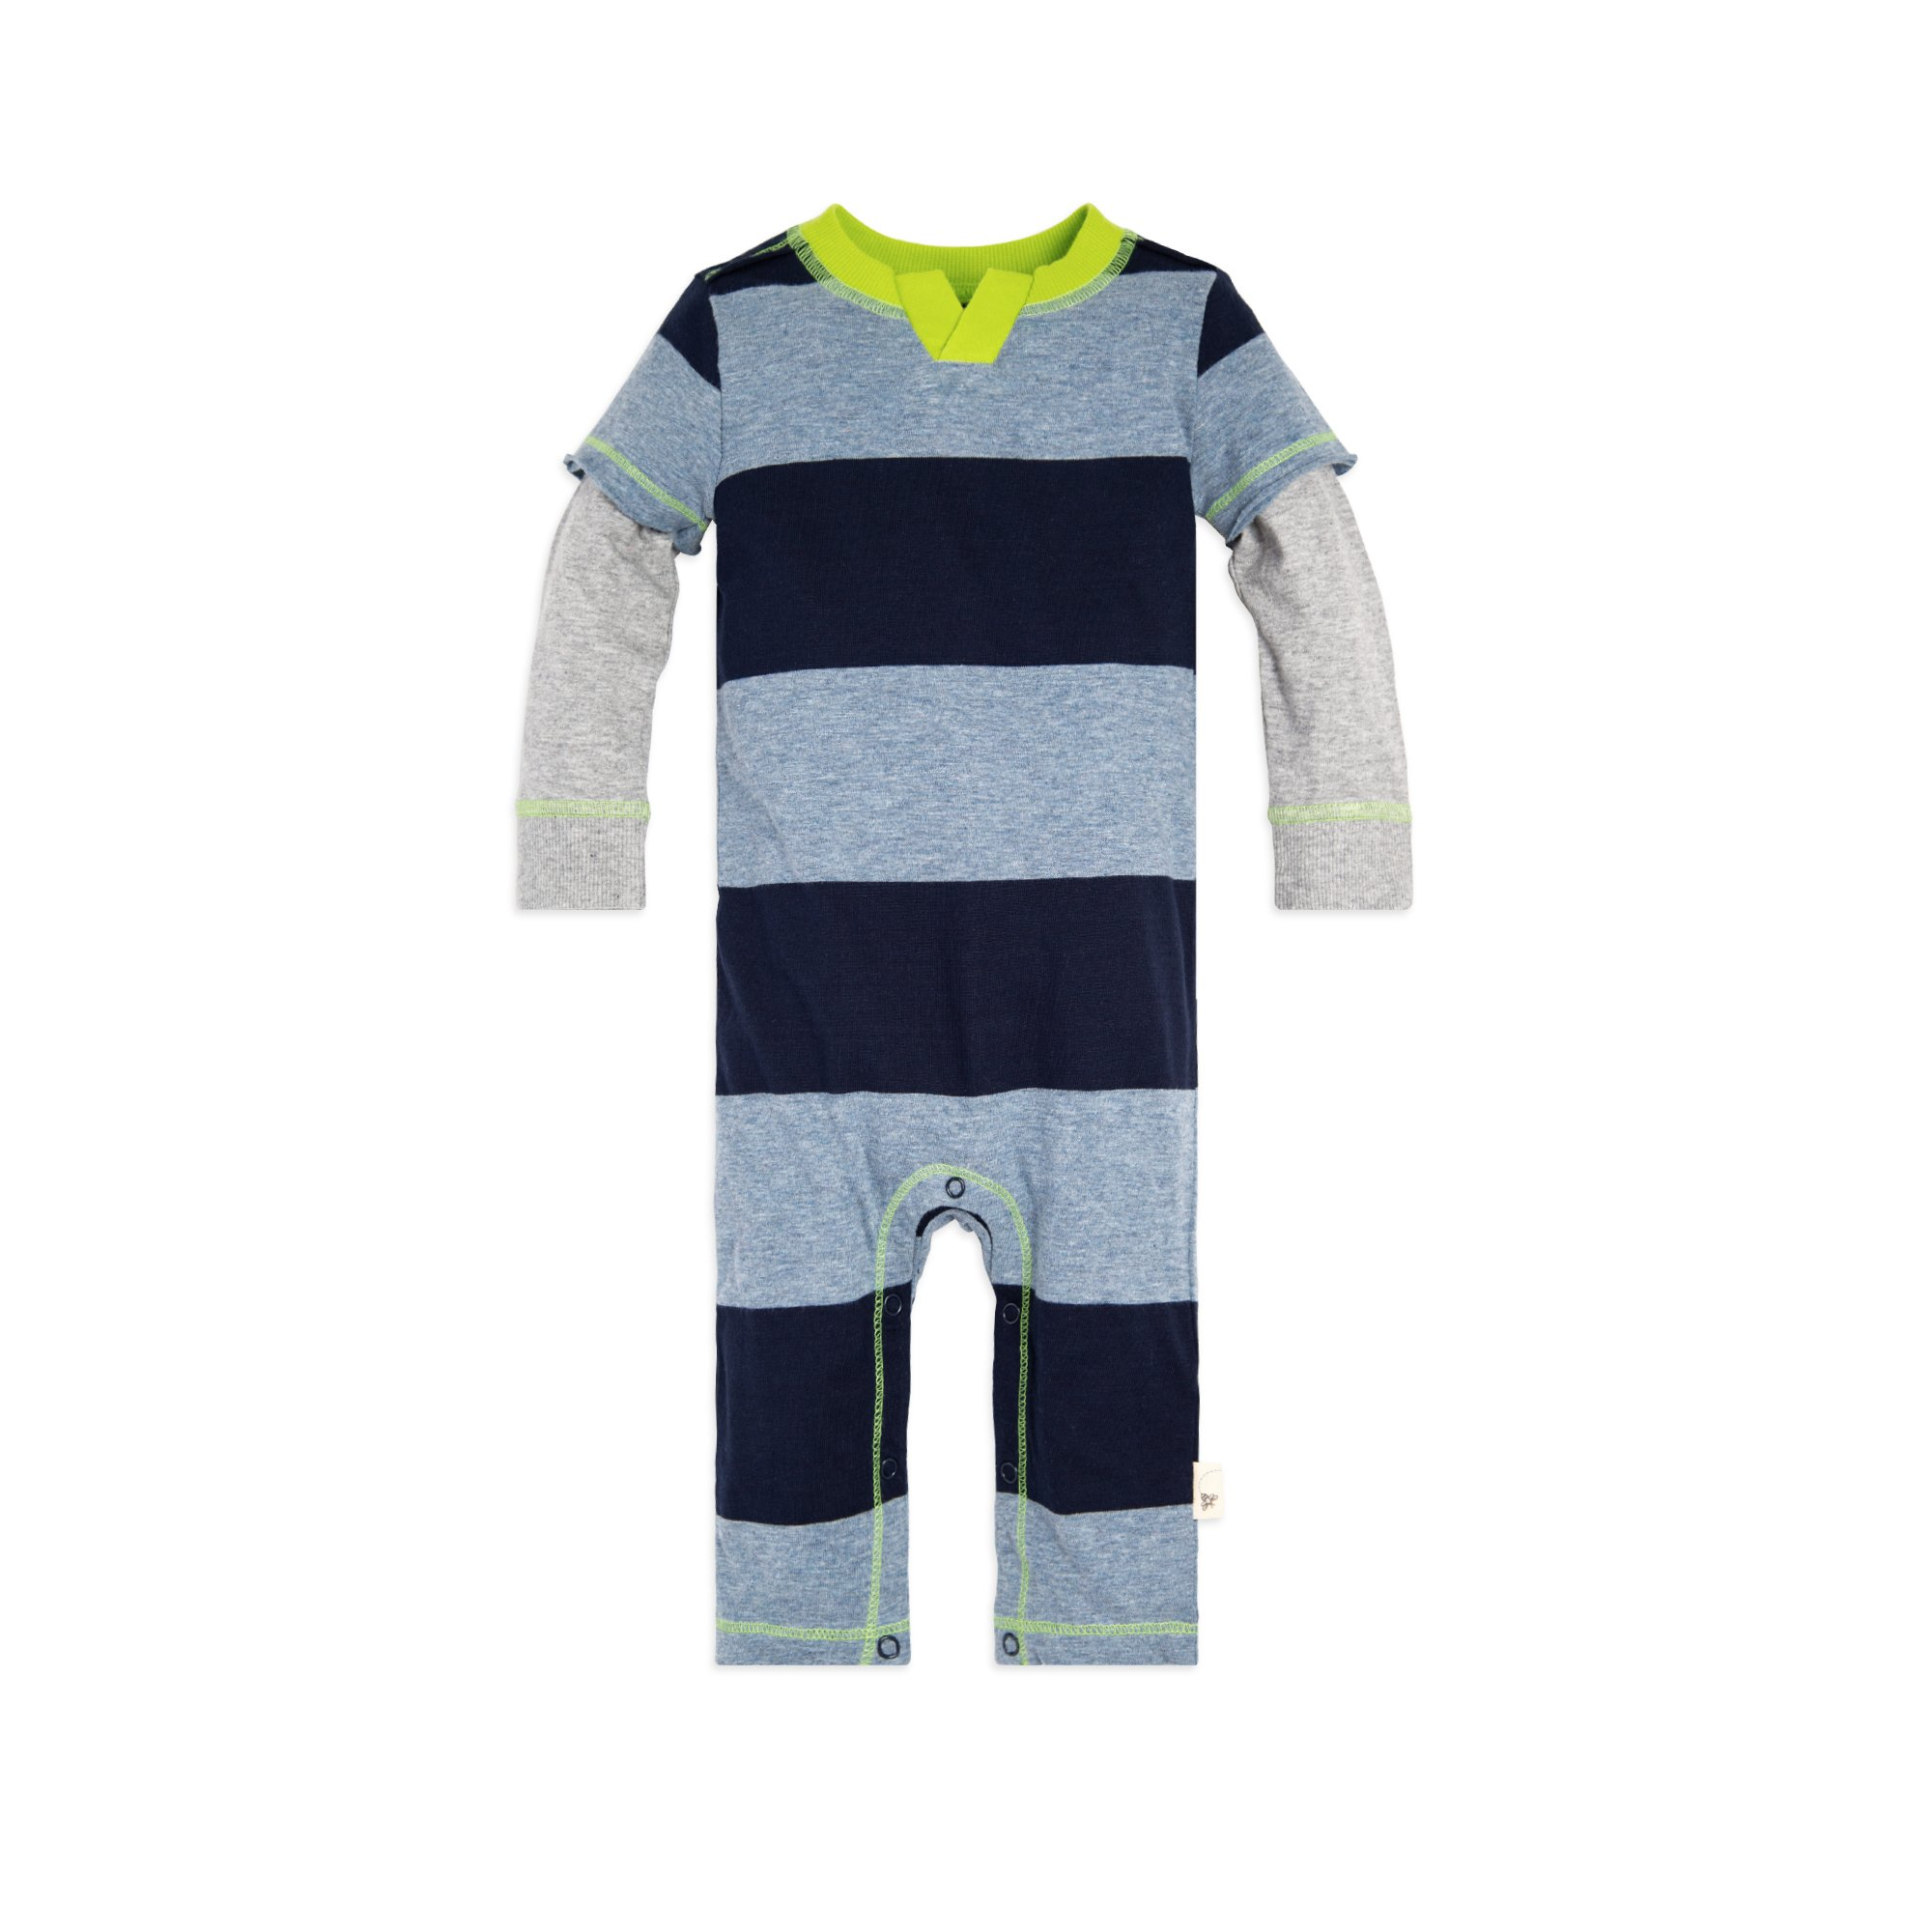 384c76a0074 Galleon - Burt s Bees Baby Boys  Romper Jumpsuit